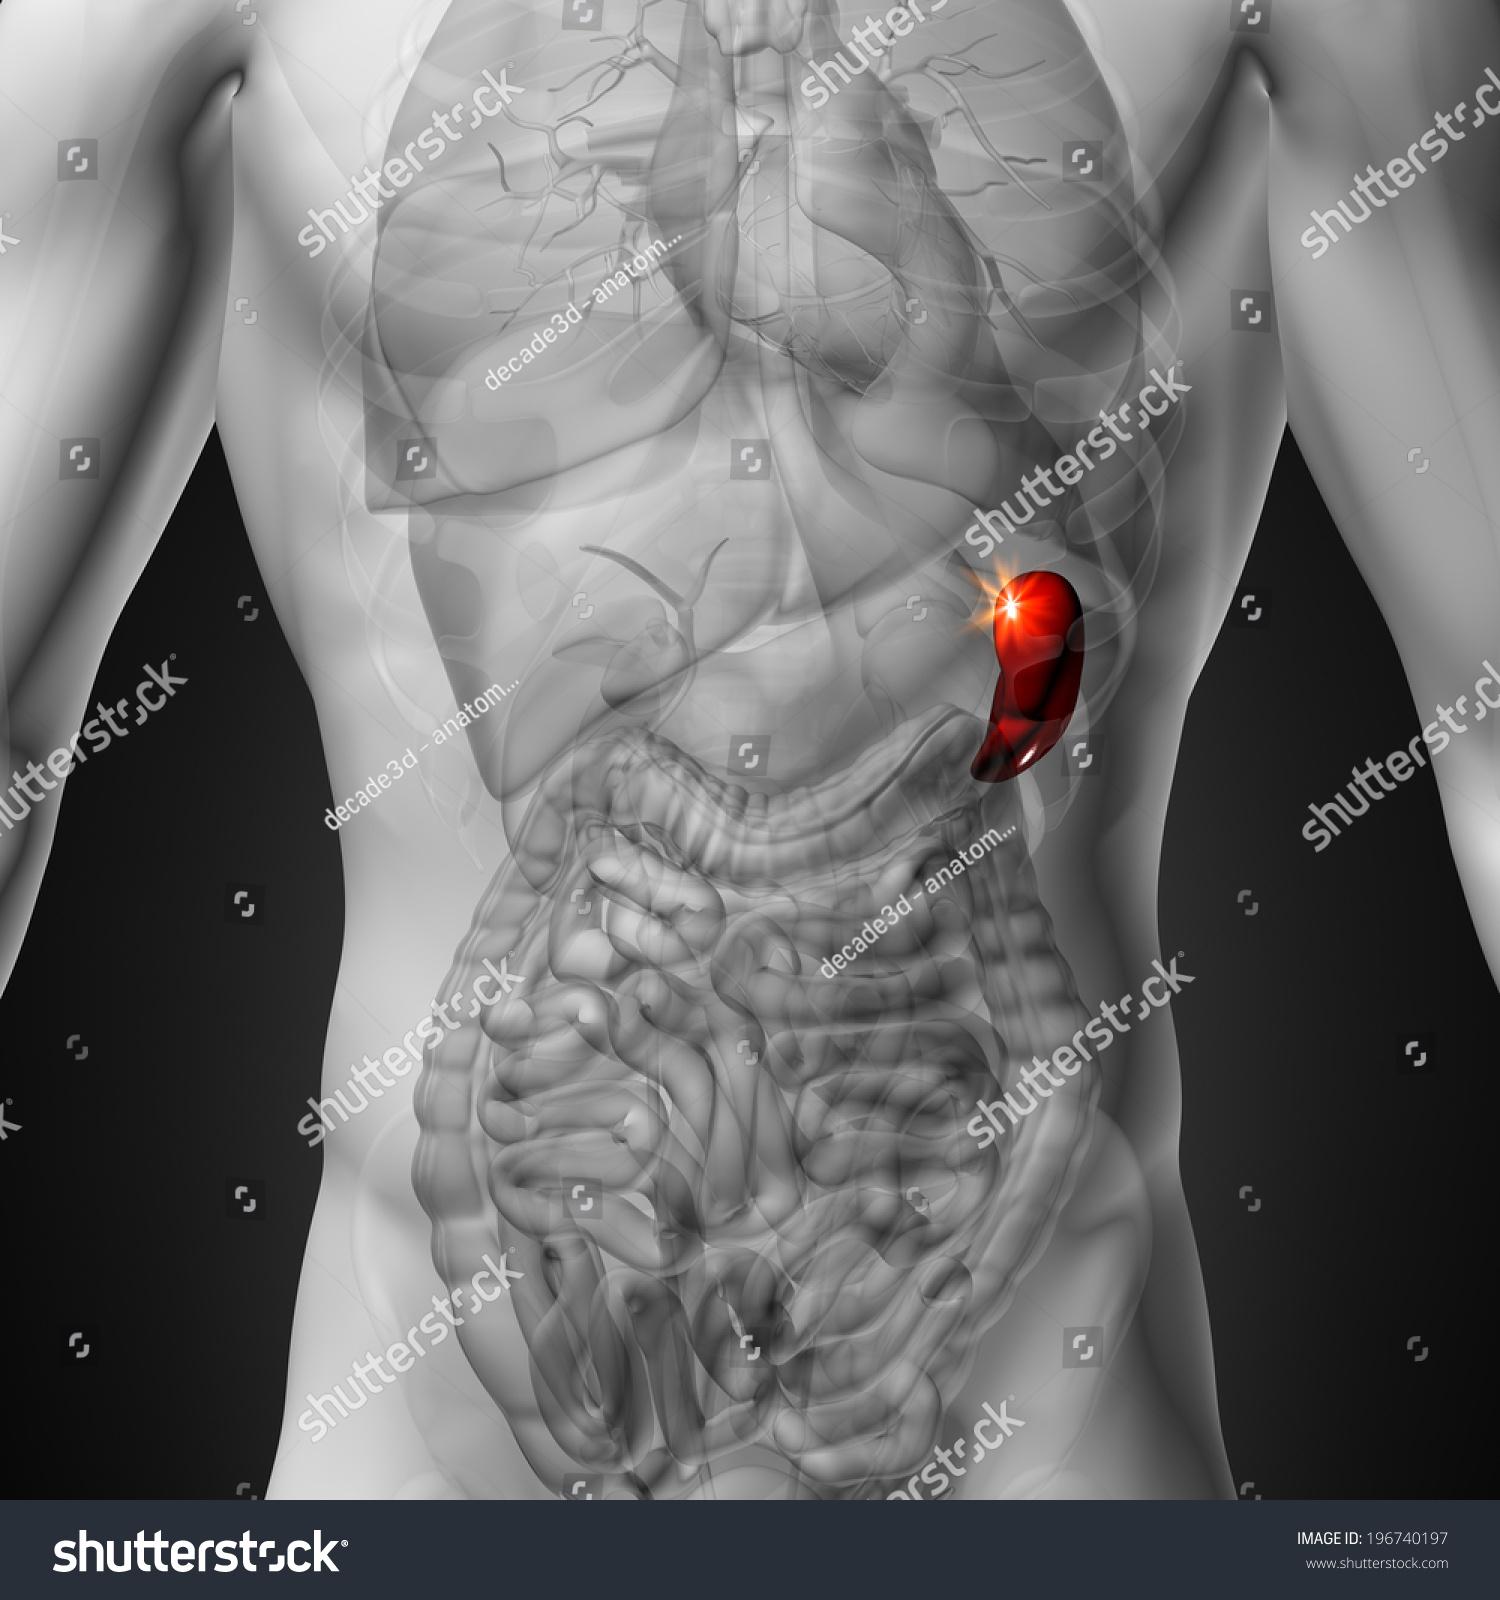 Spleen Male Anatomy Human Organs Stock Illustration 196740197 ...